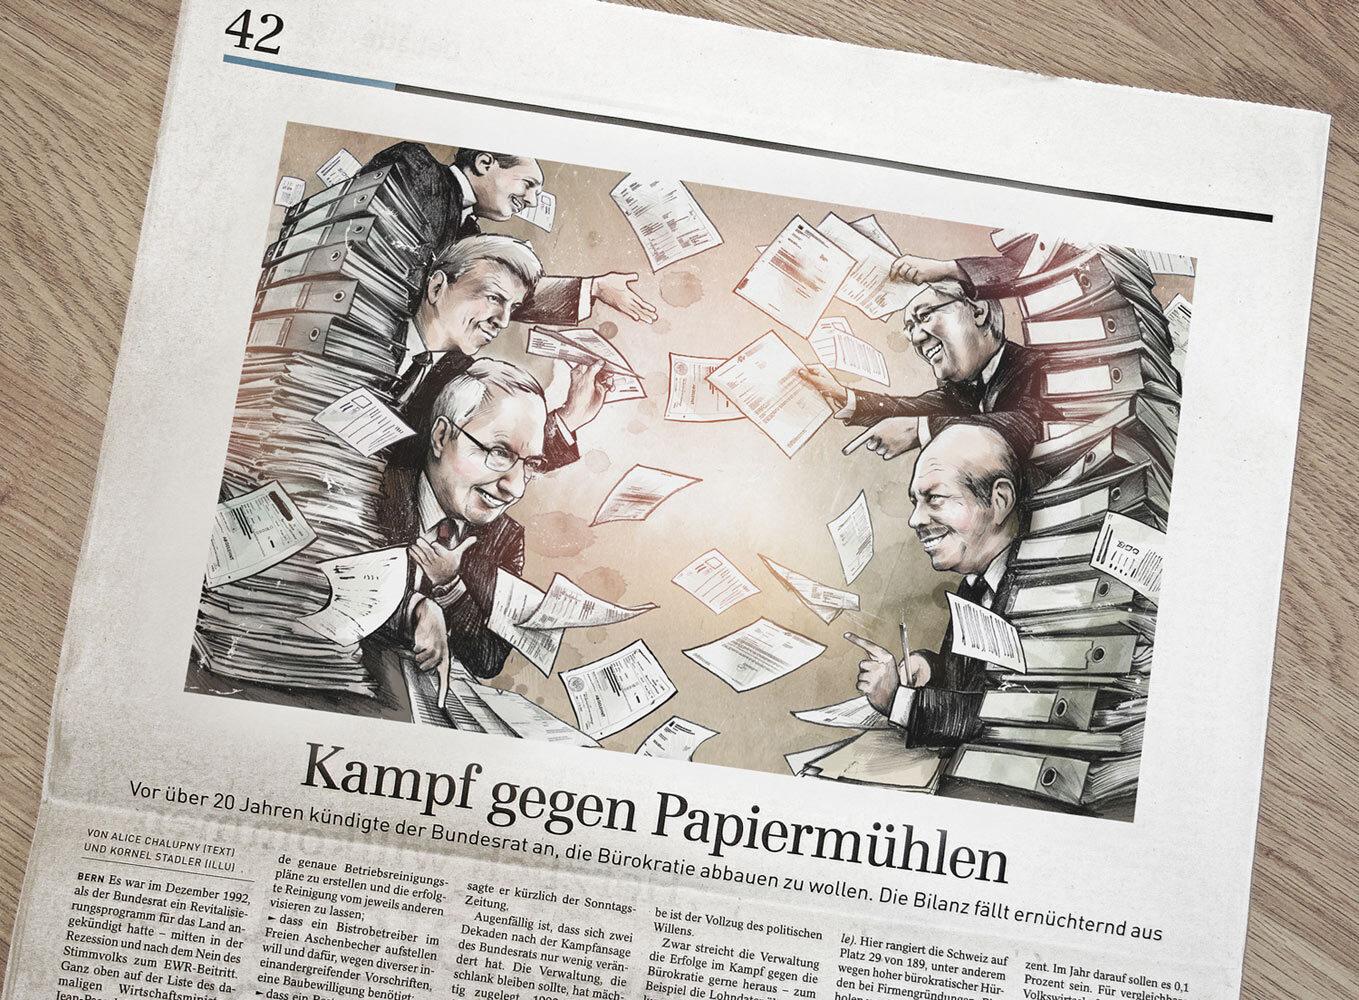 Foto SZ Burokratie - Kornel Illustration | Kornel Stadler portfolio